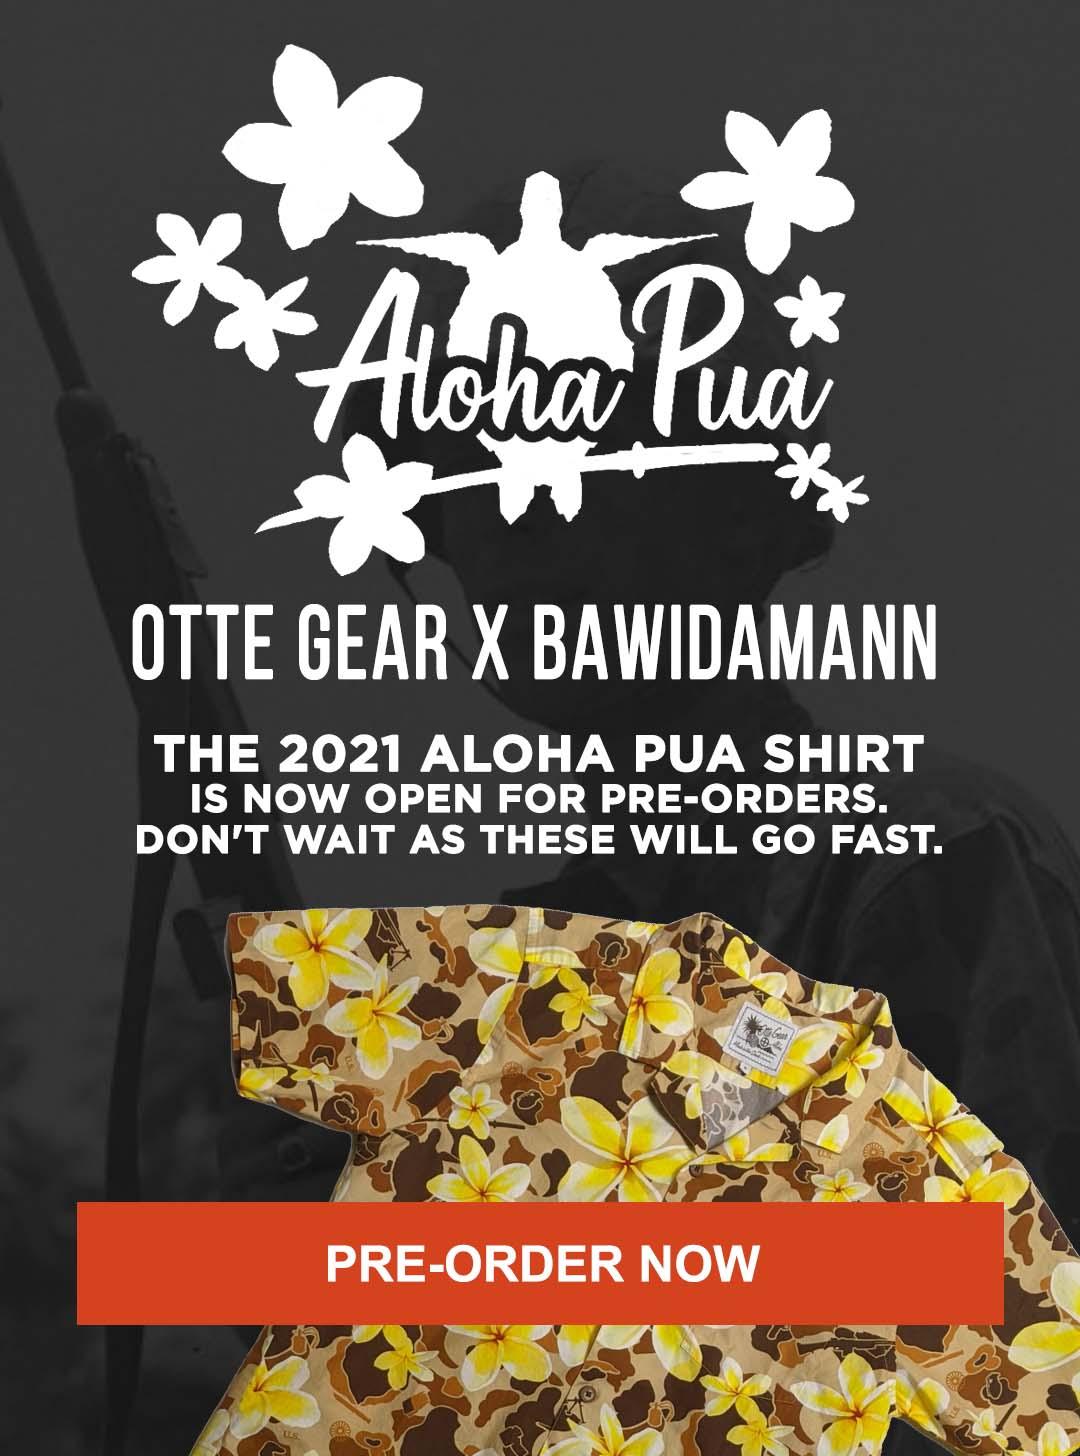 Pre Order The 2021 ALOHA PUA SHIRT